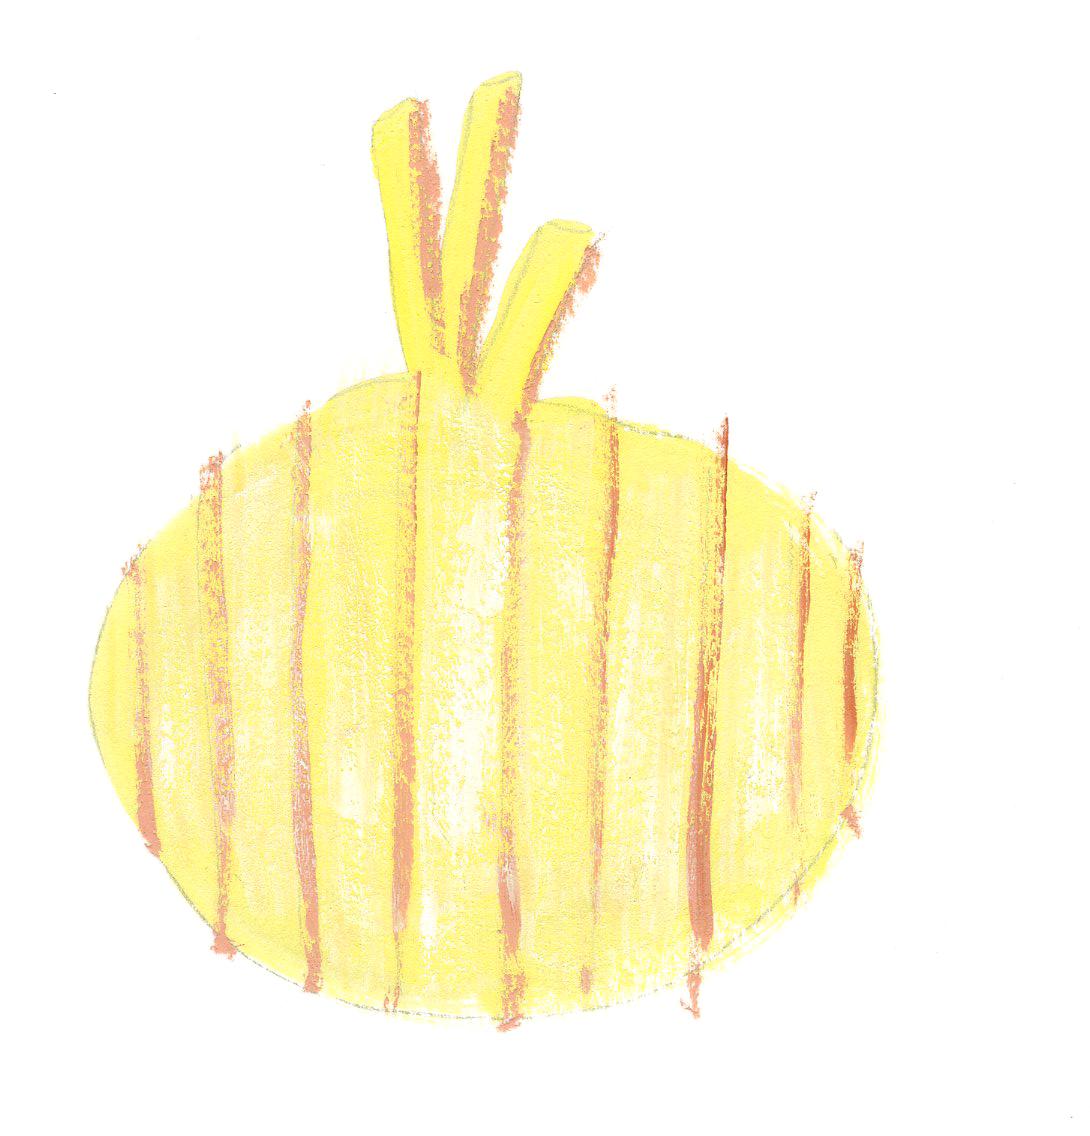 onion copy.jpg